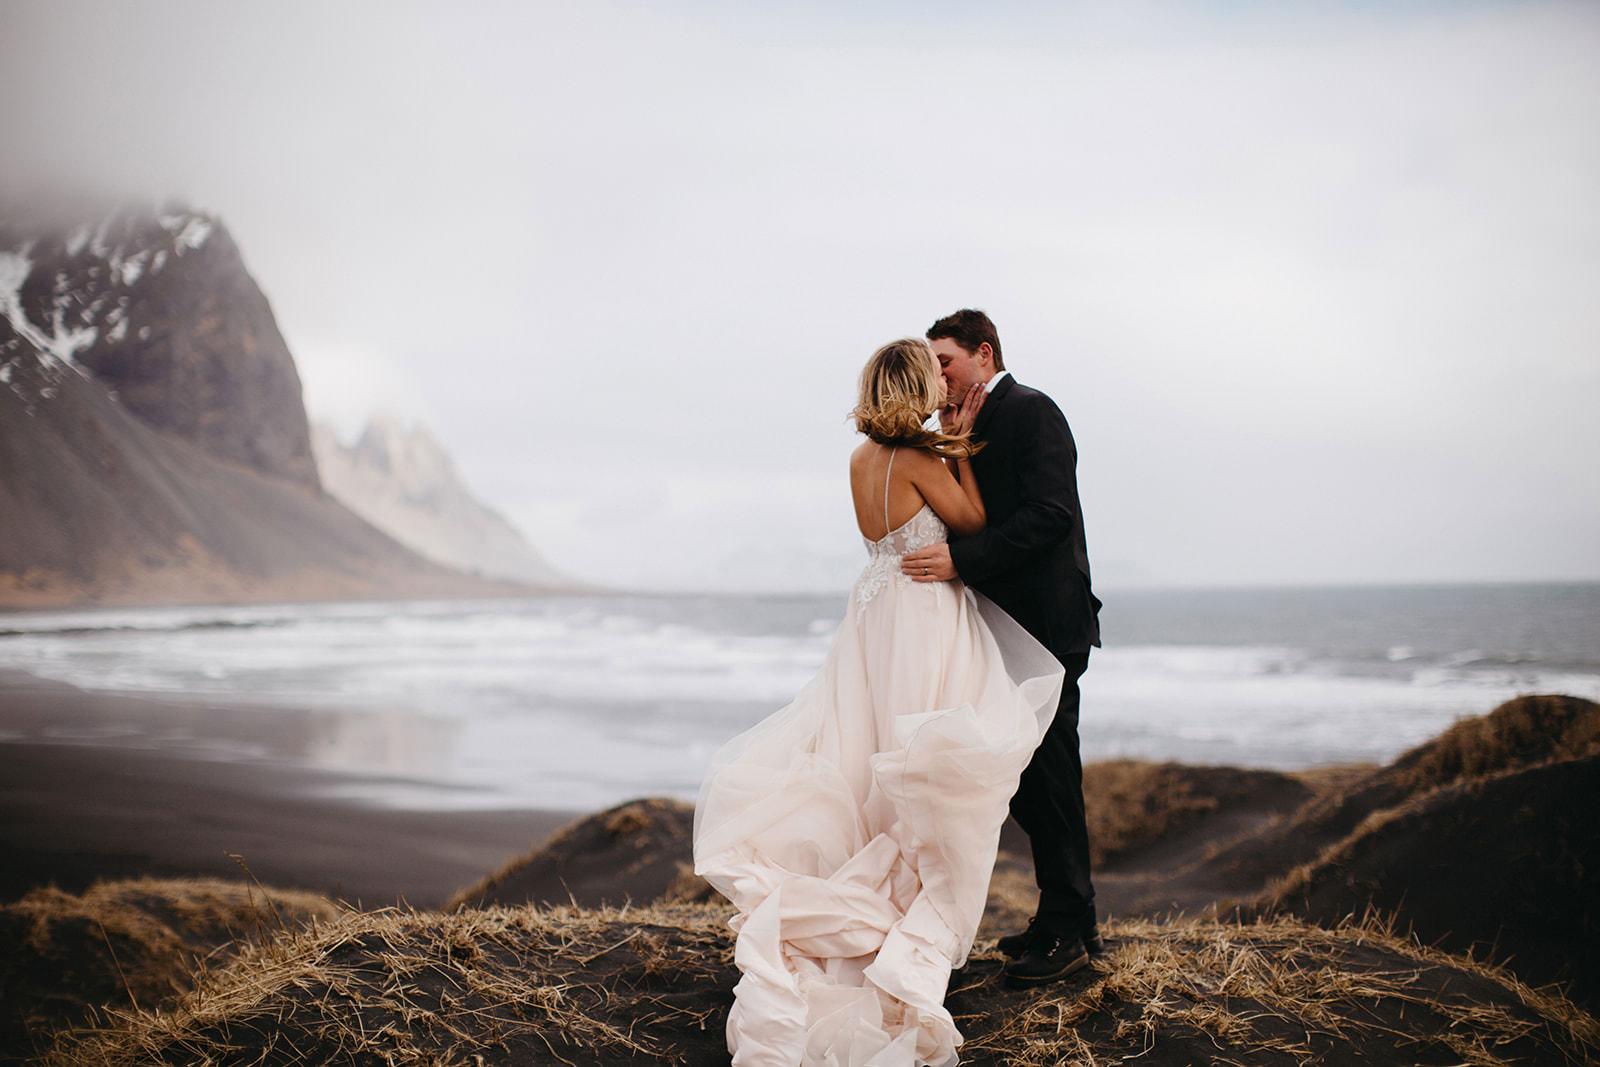 Icelandic Iceland Elopement Wedding Elope Photographer Eloping Reykjavík Vik Black Sand Beach Jökulsárlón Skogafoss Waterfall Vestrahorn Mountain Liz Osban Photography Destination 25.jpg